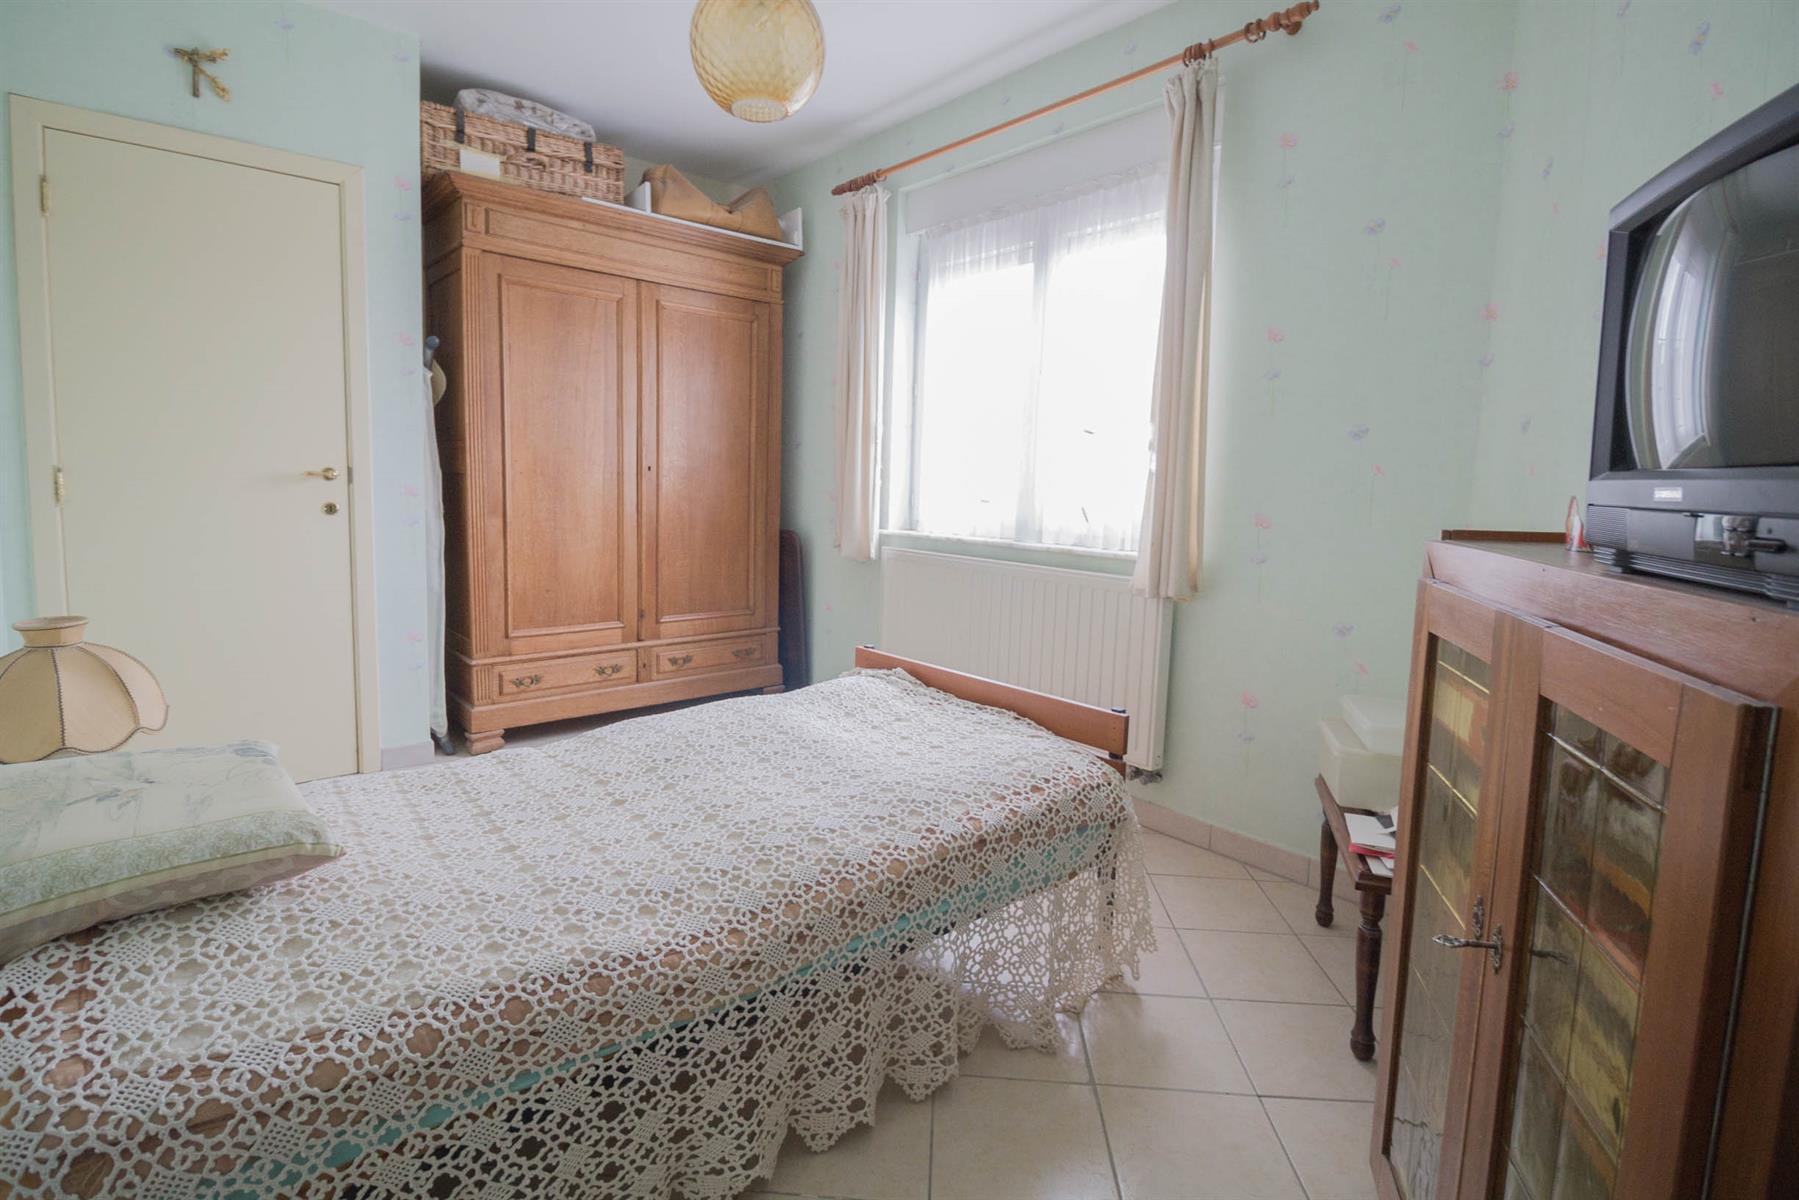 Appartement - Trazegnies - #4359277-18